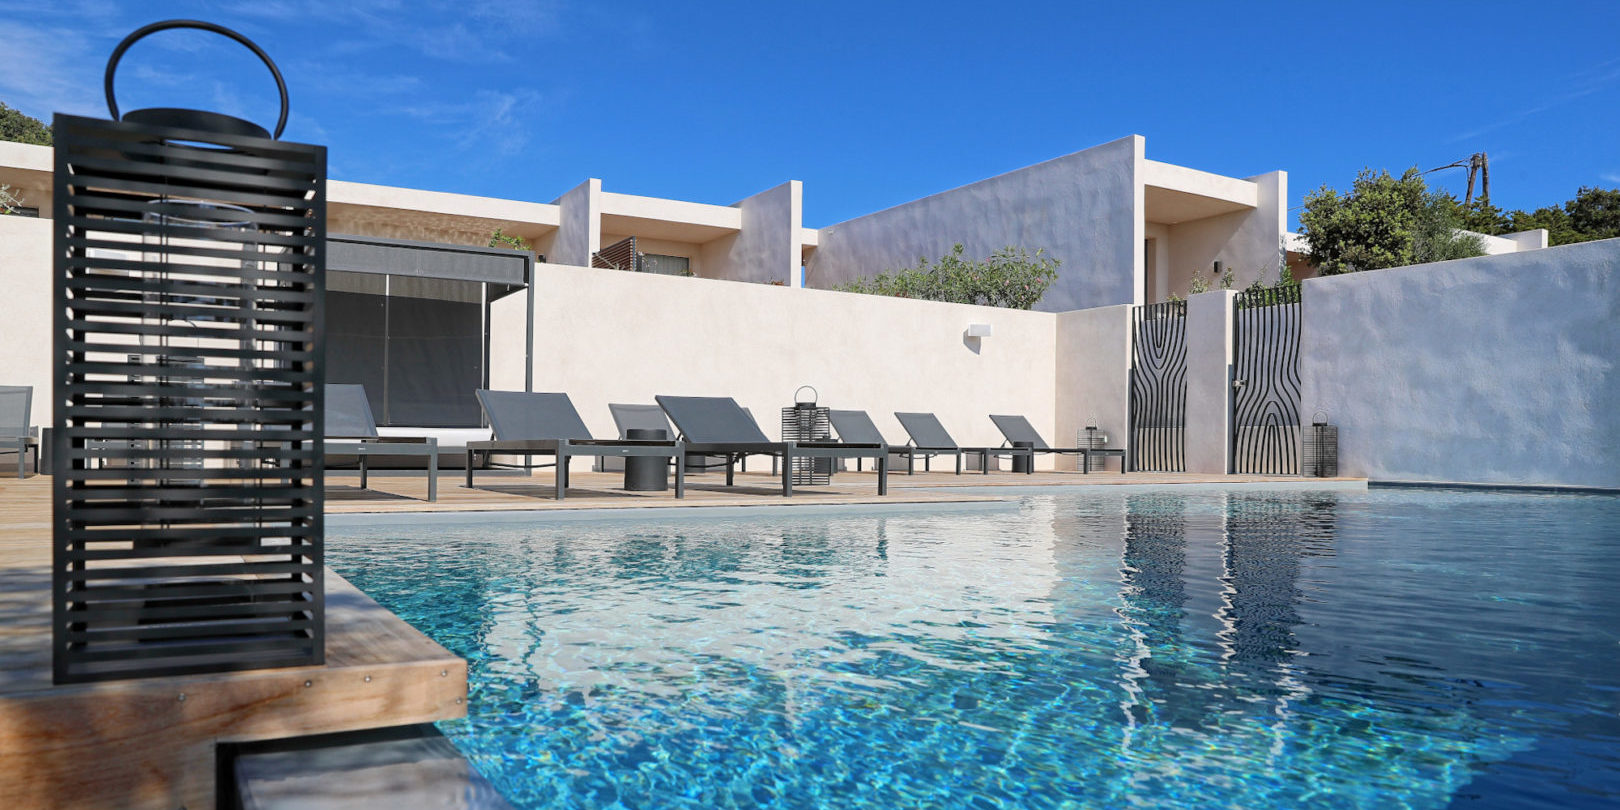 Hotel Cala di Greco Bonifacio Corsica Zuid-Corsica Frankrijk zwembad design strak ligbedden